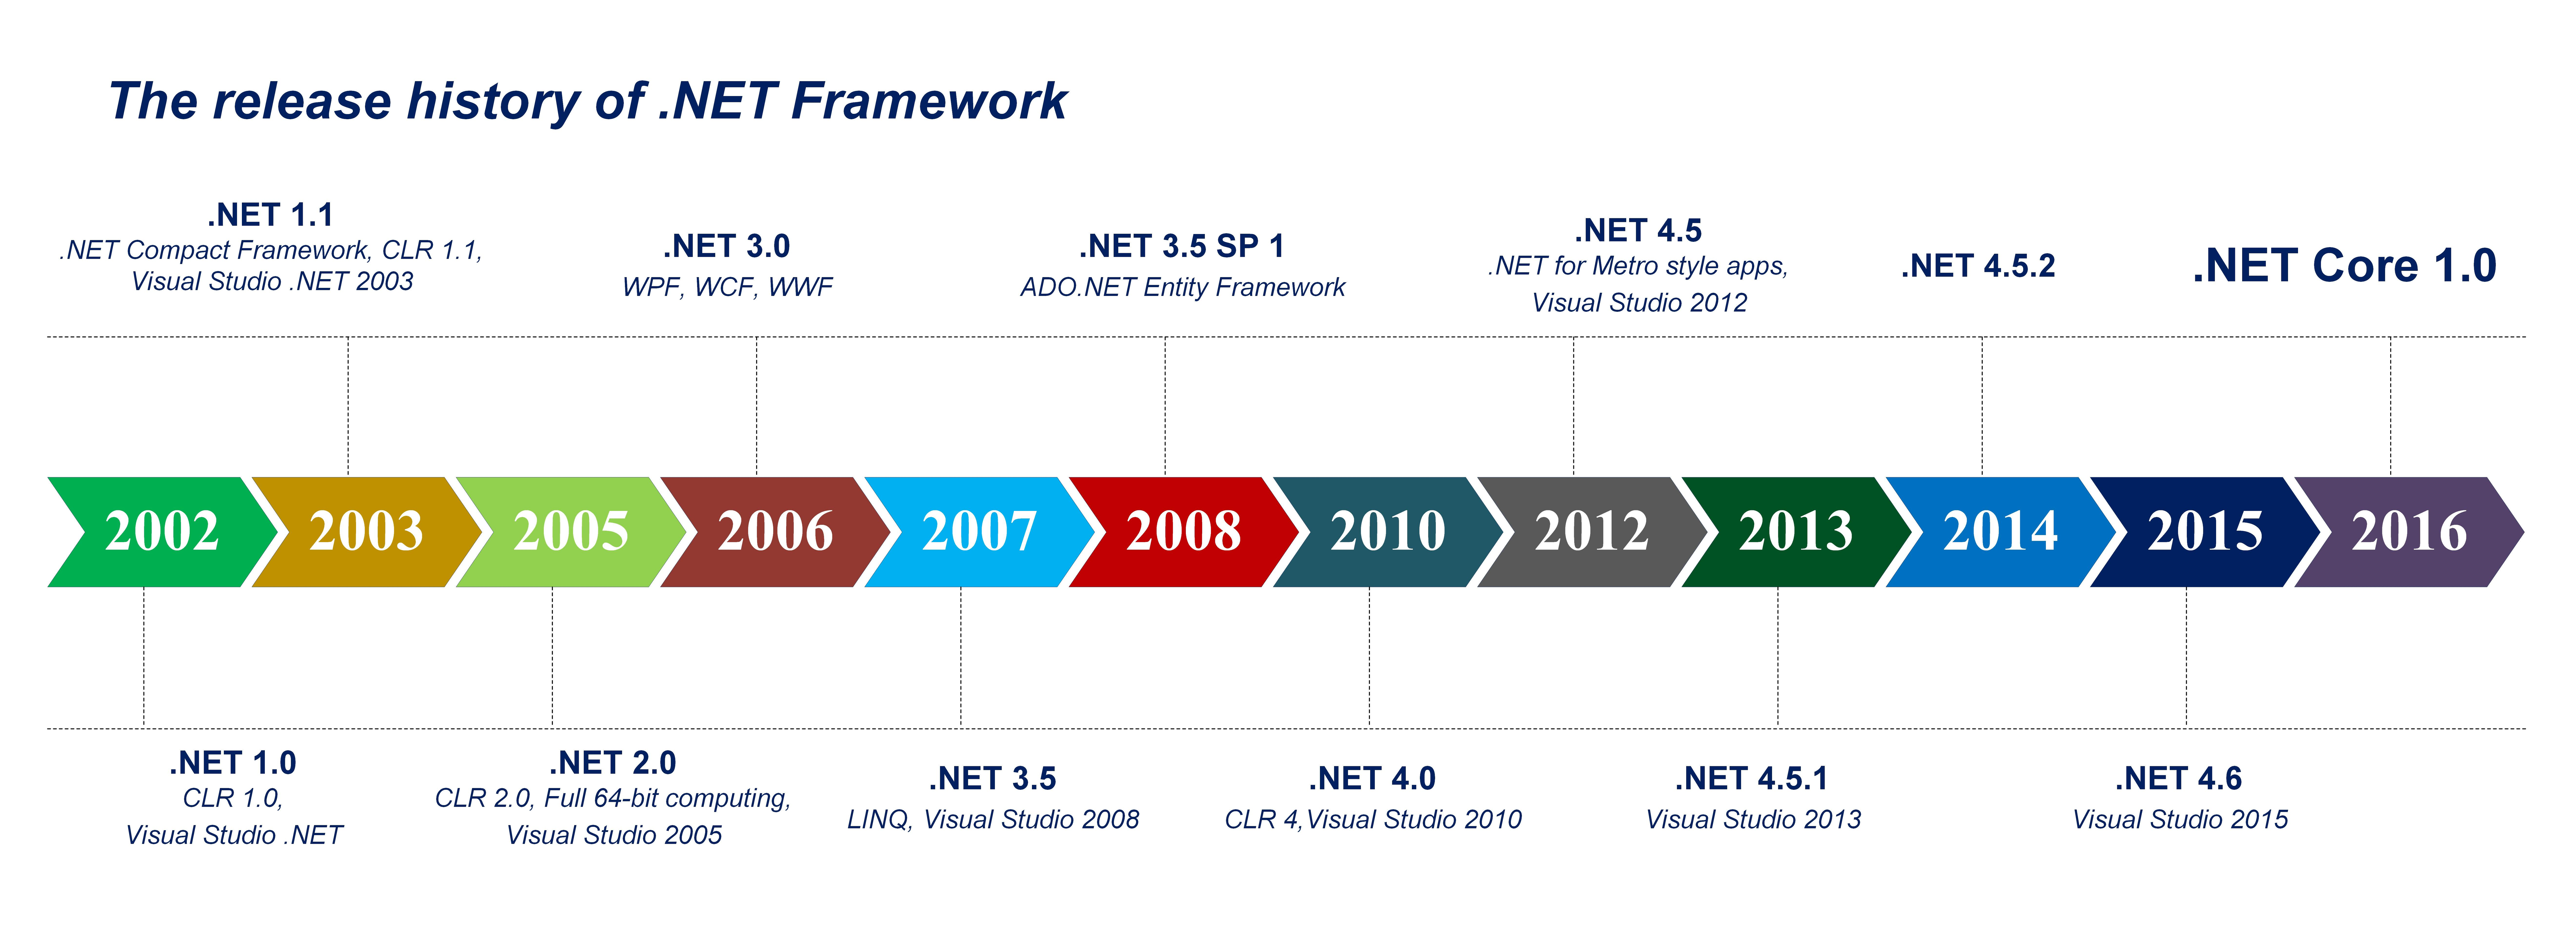 The release history of .NET Framework